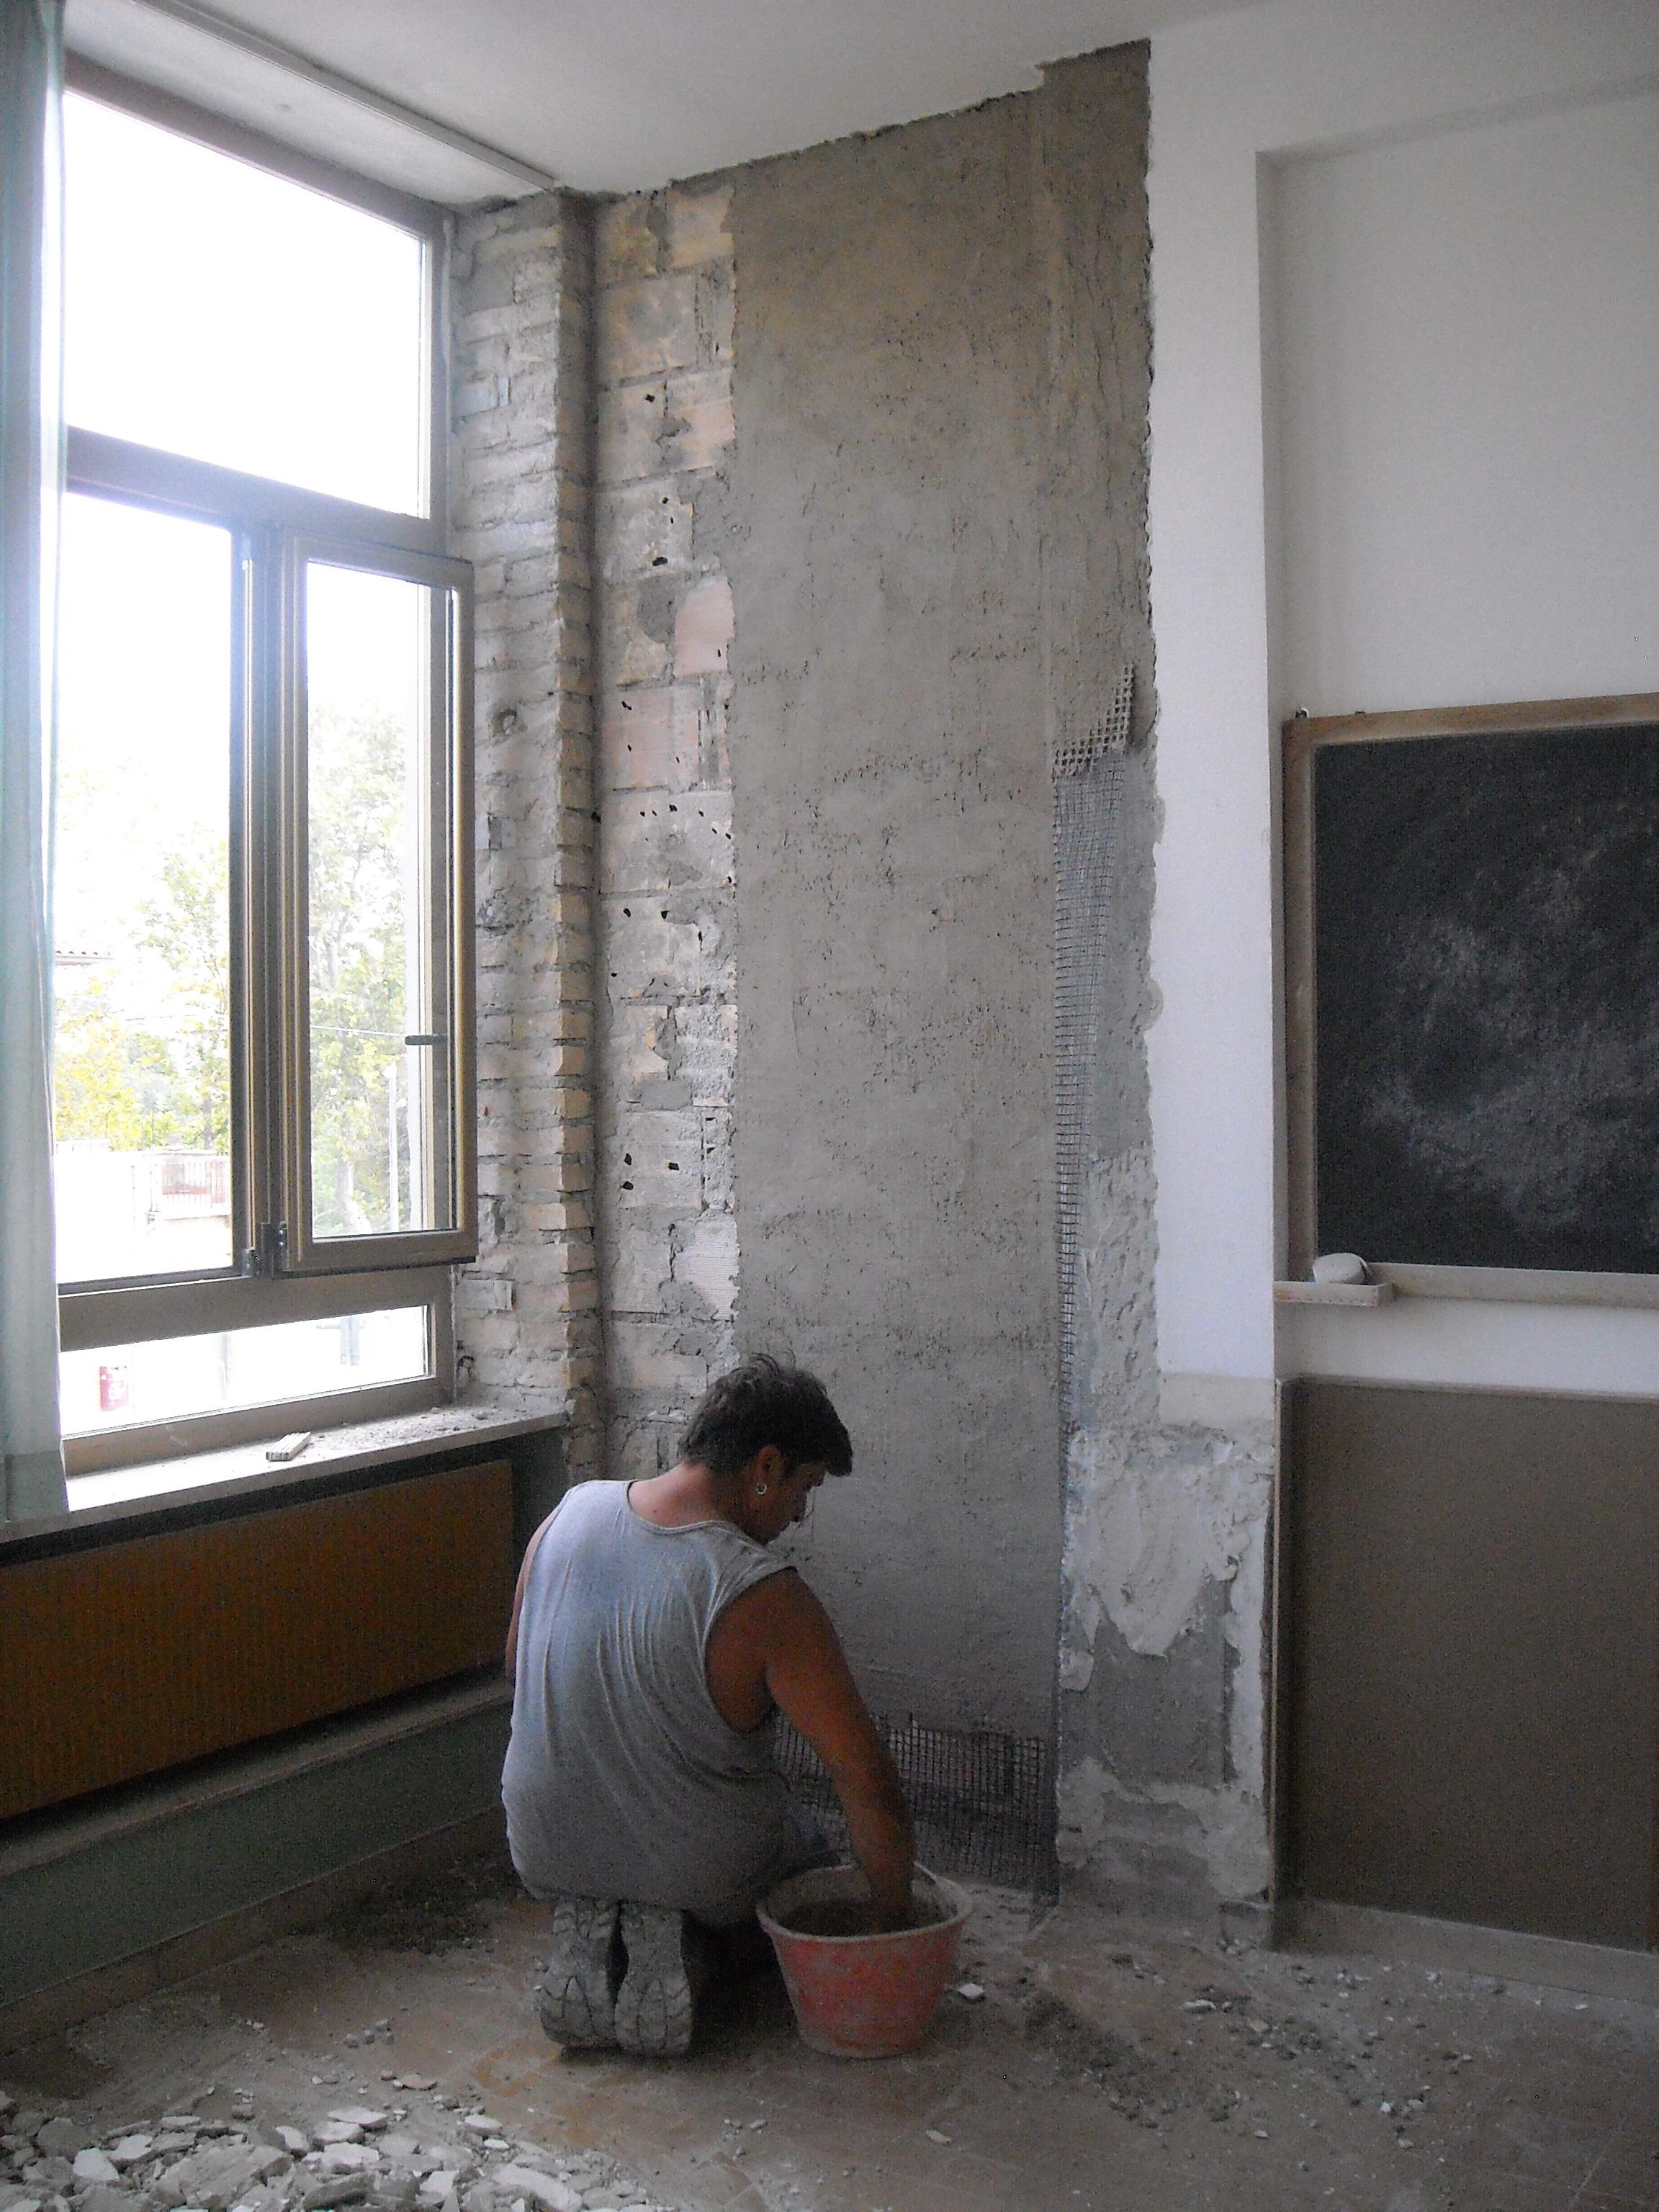 liceo classico intervento sisma